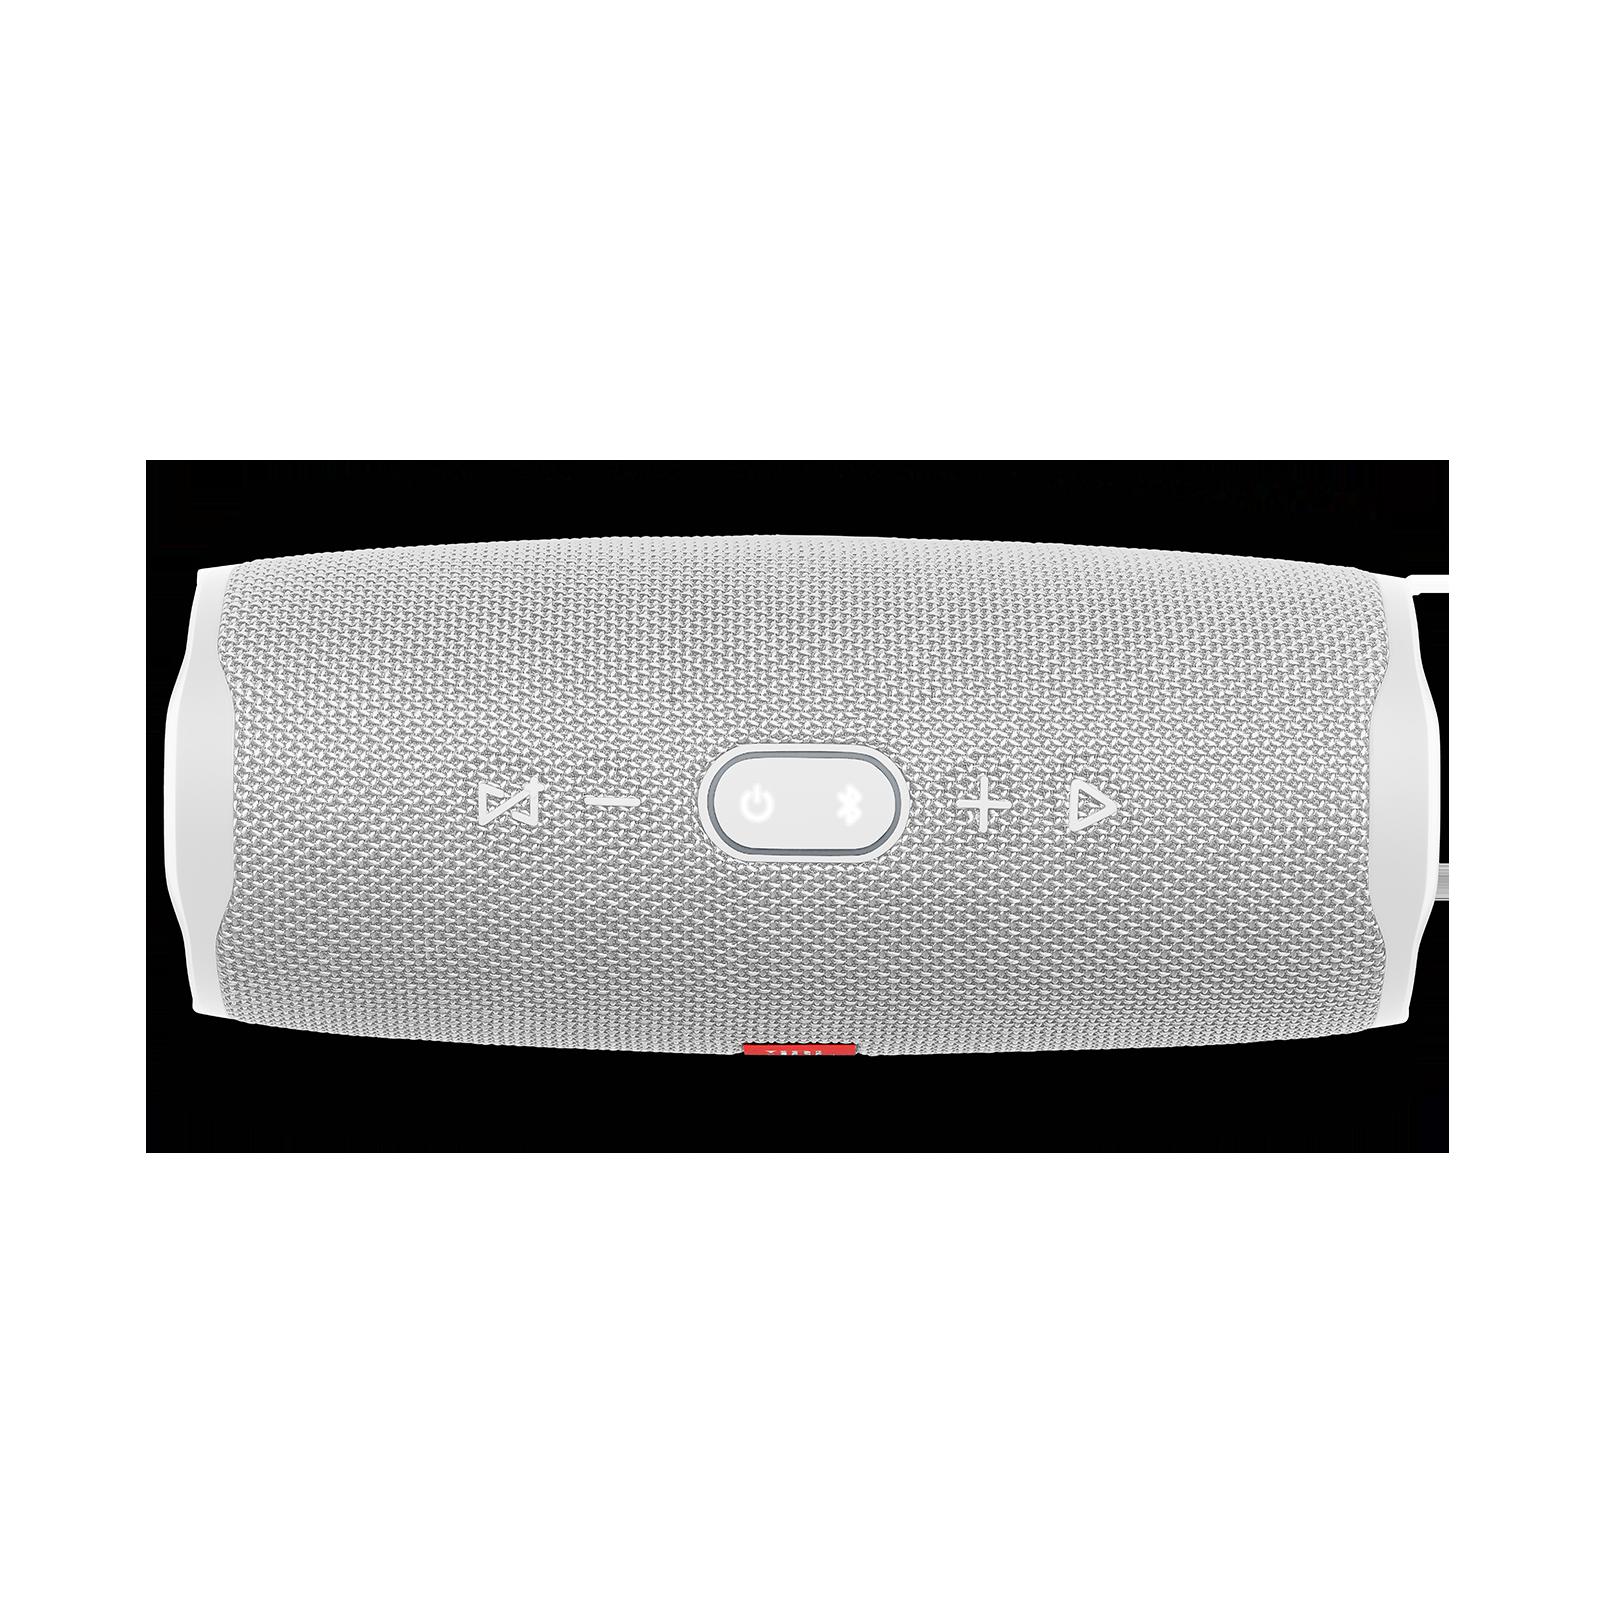 JBL Charge 4 - White - Portable Bluetooth speaker - Detailshot 1